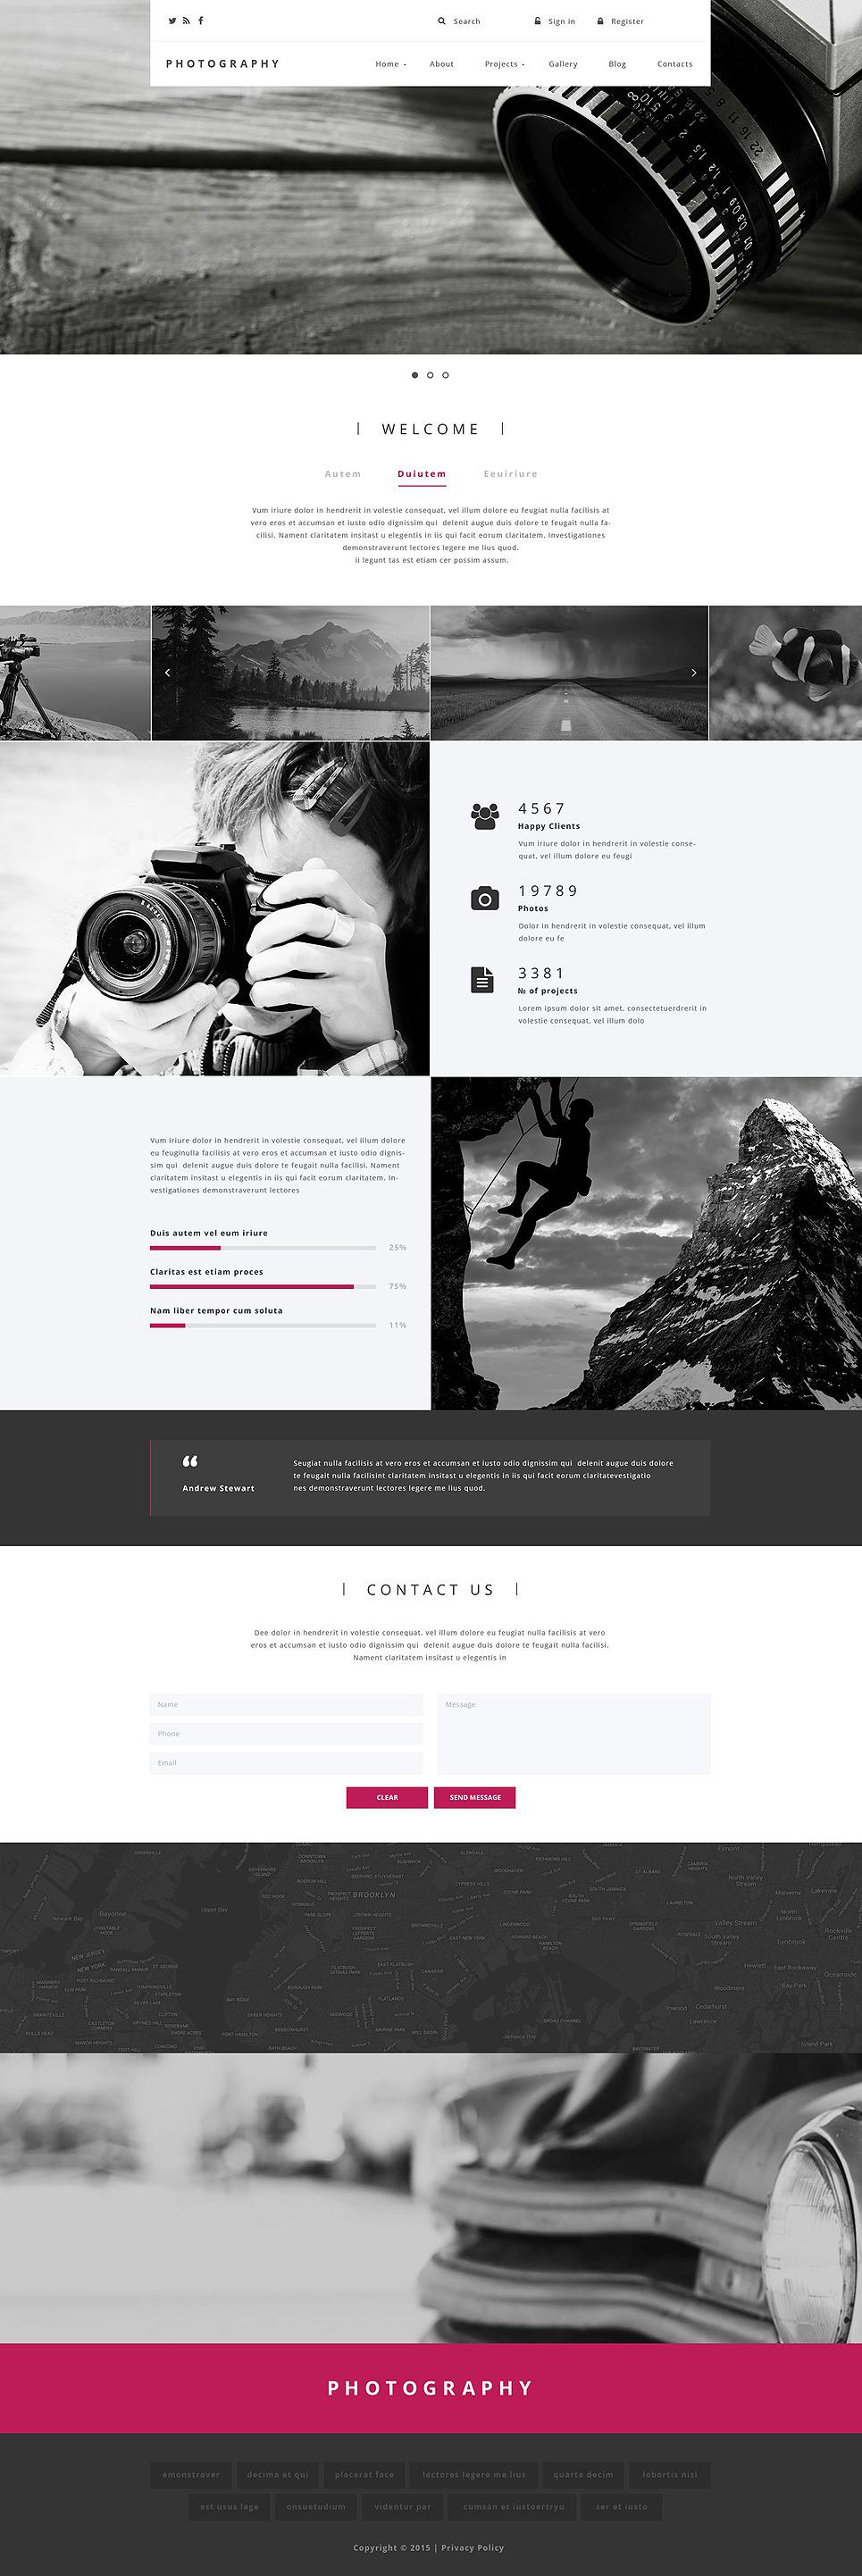 Photography Drupal Template New Screenshots BIG